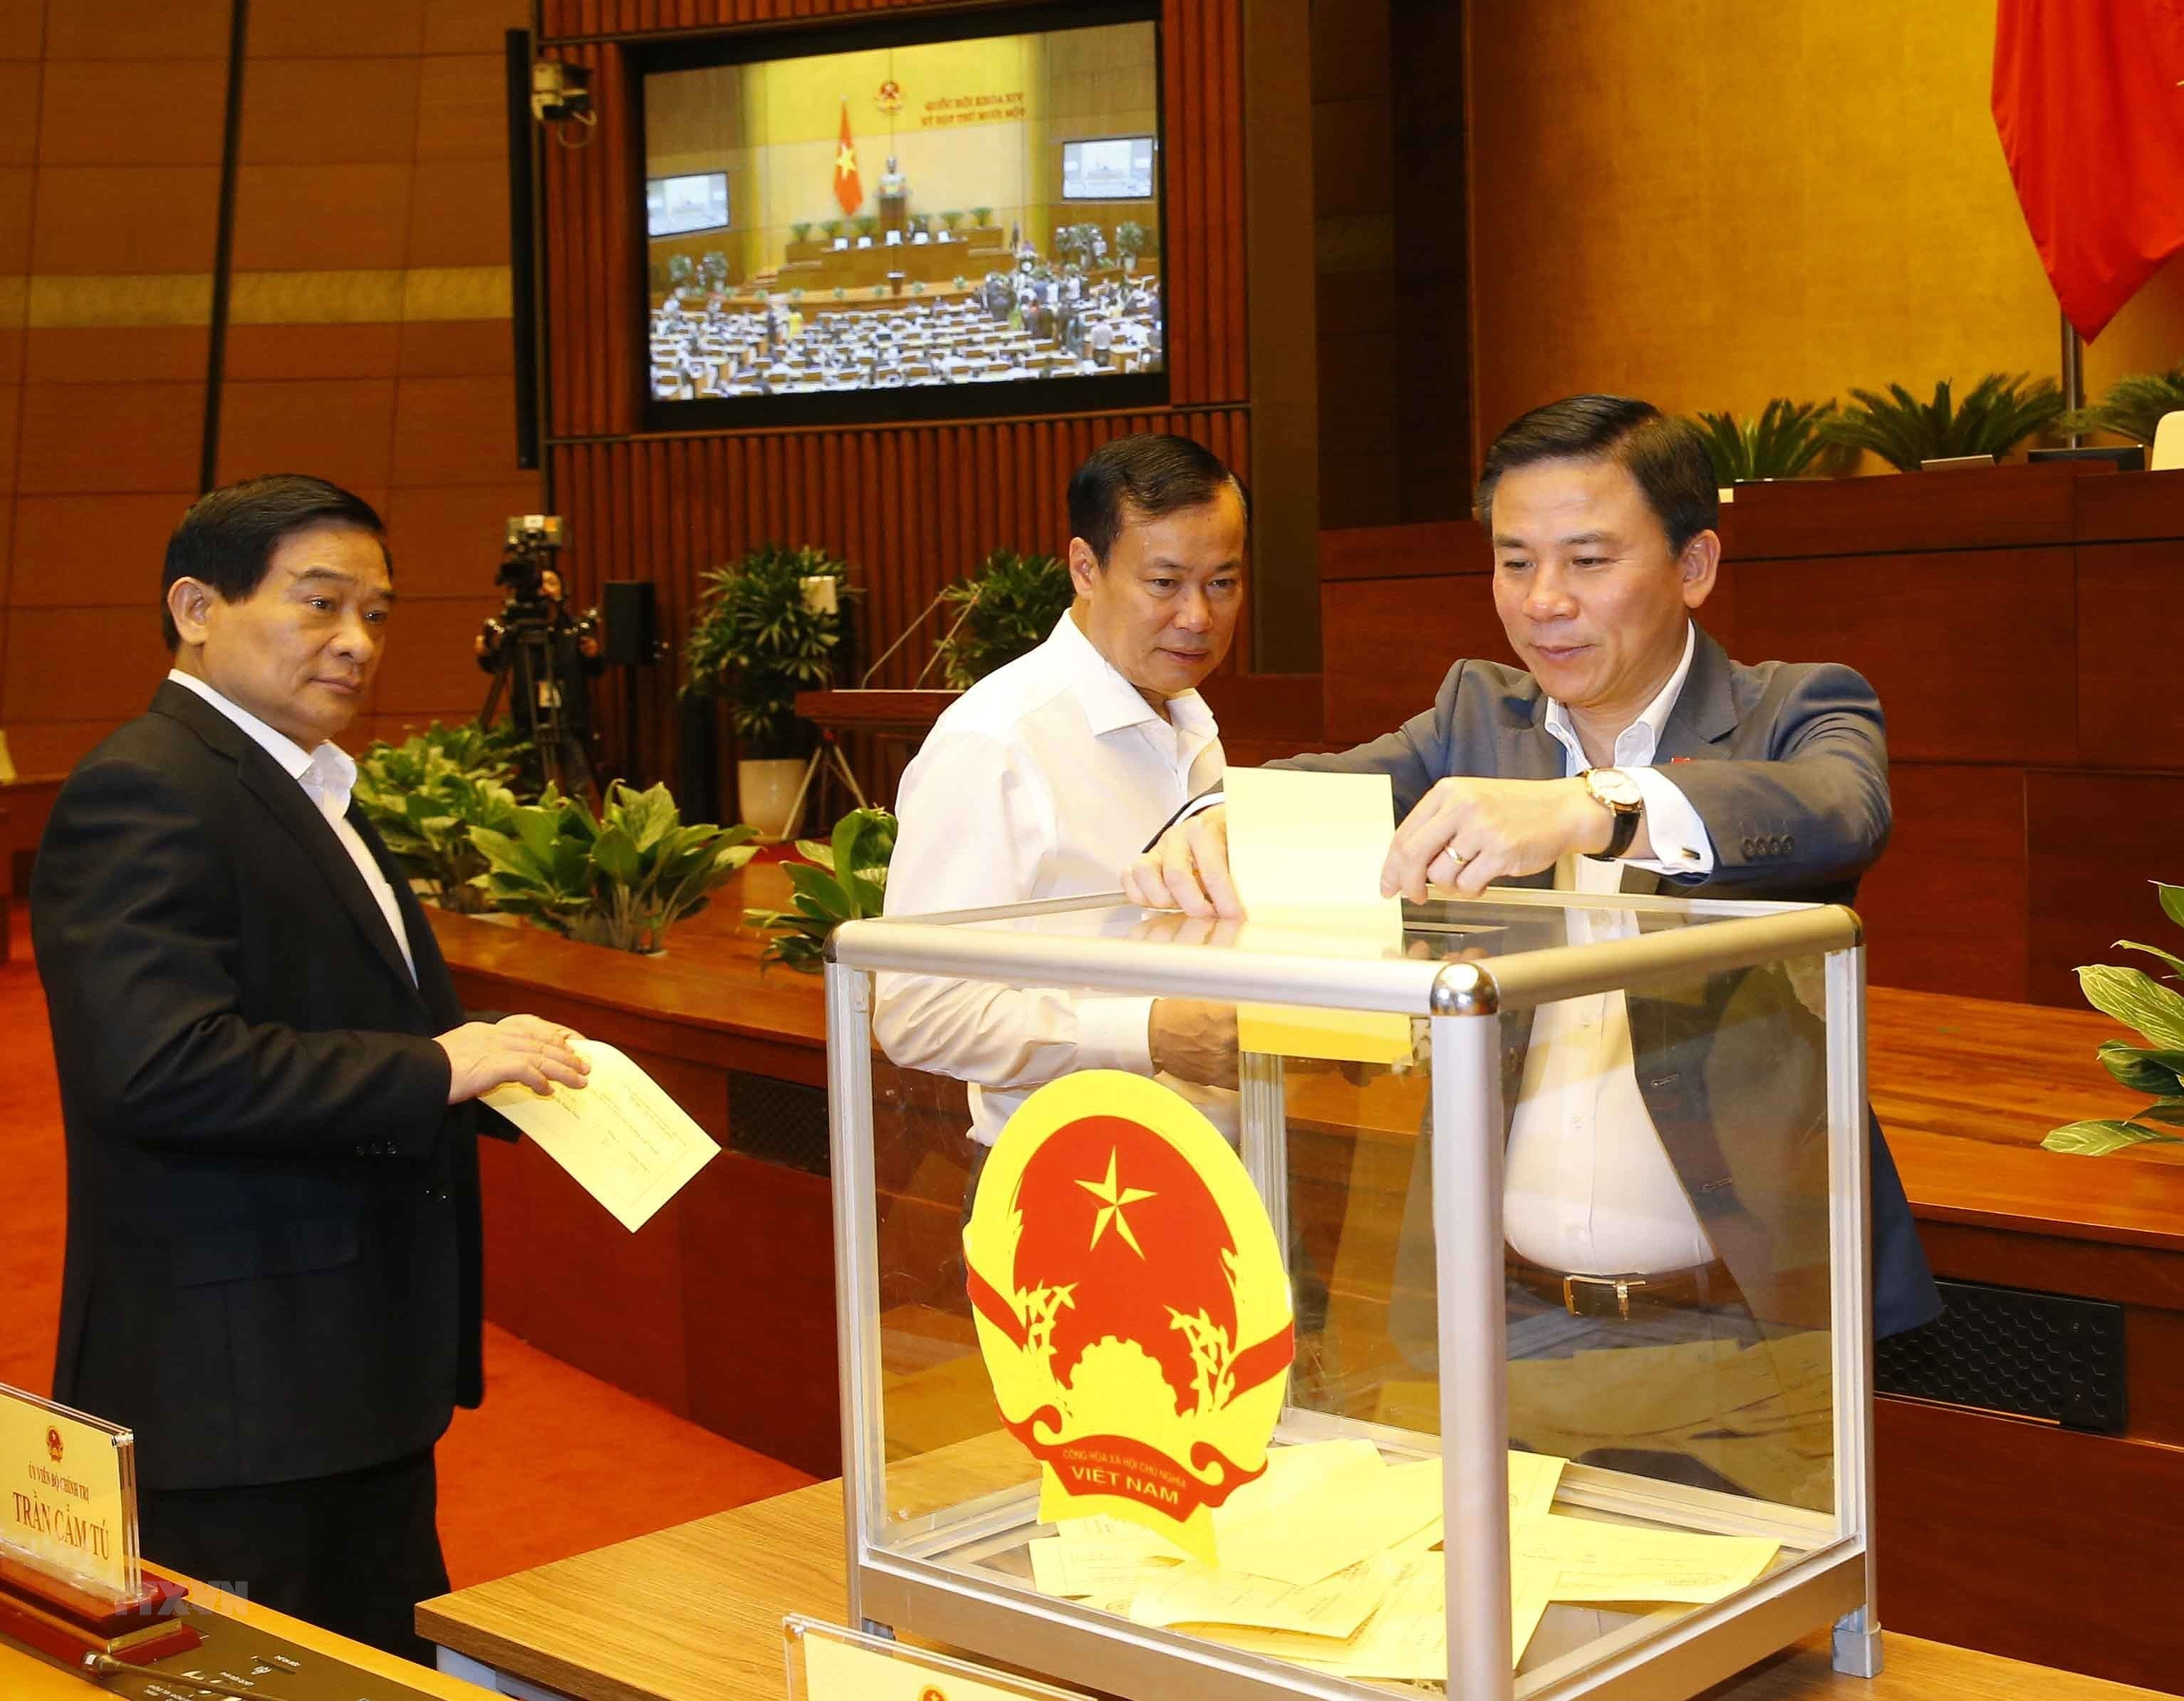 [Photo] Quoc hoi tien hanh quy trinh bo phieu bau Chu tich nuoc hinh anh 13